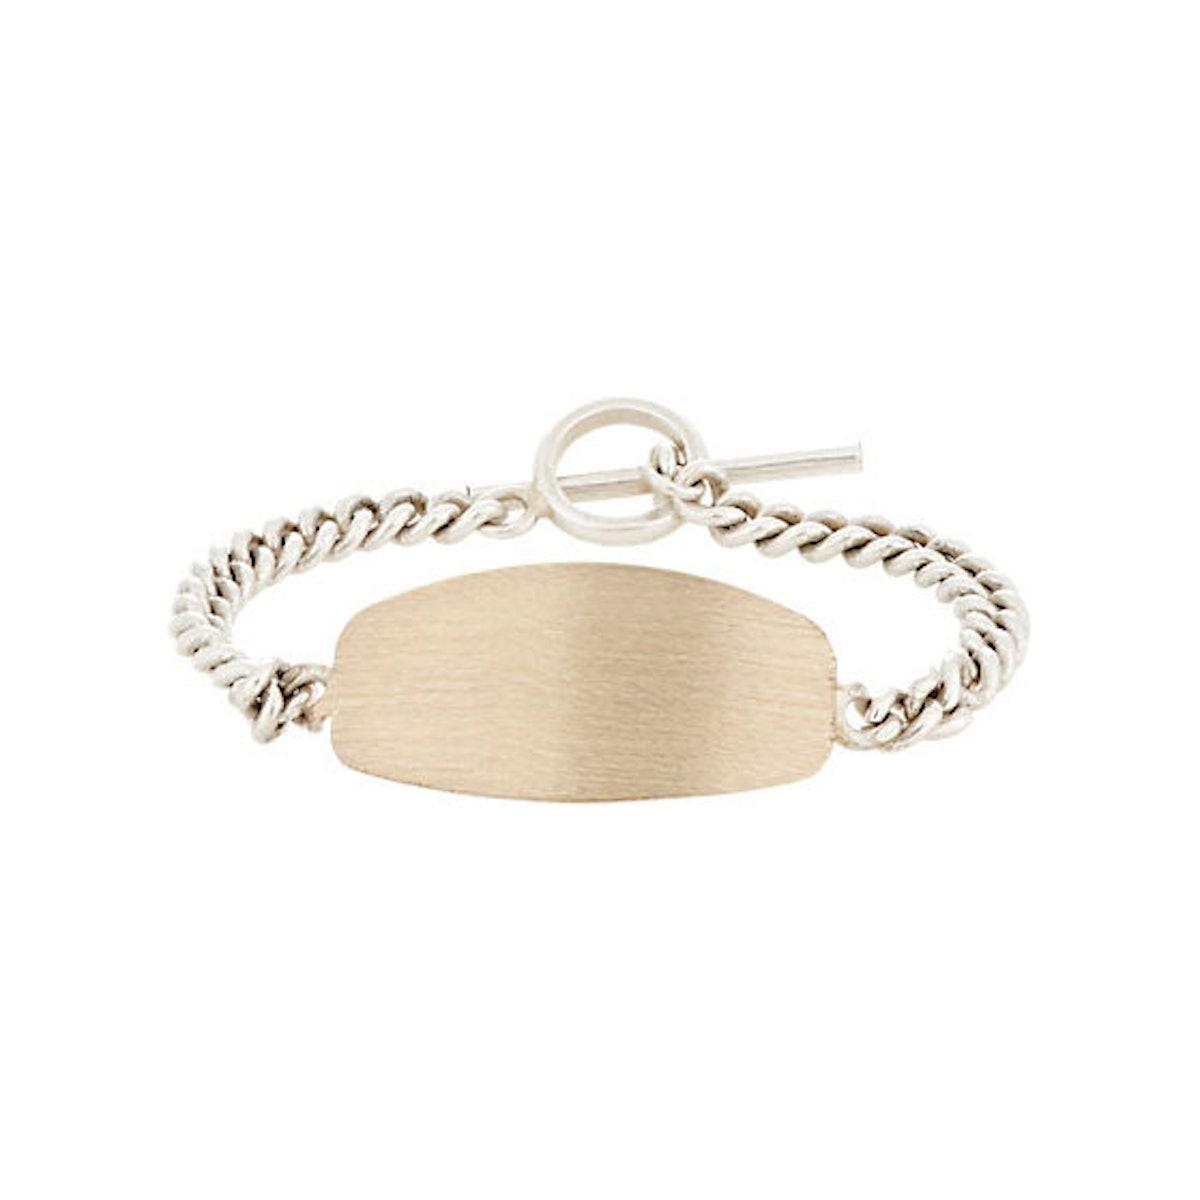 Maison Martin Margiela bracelet